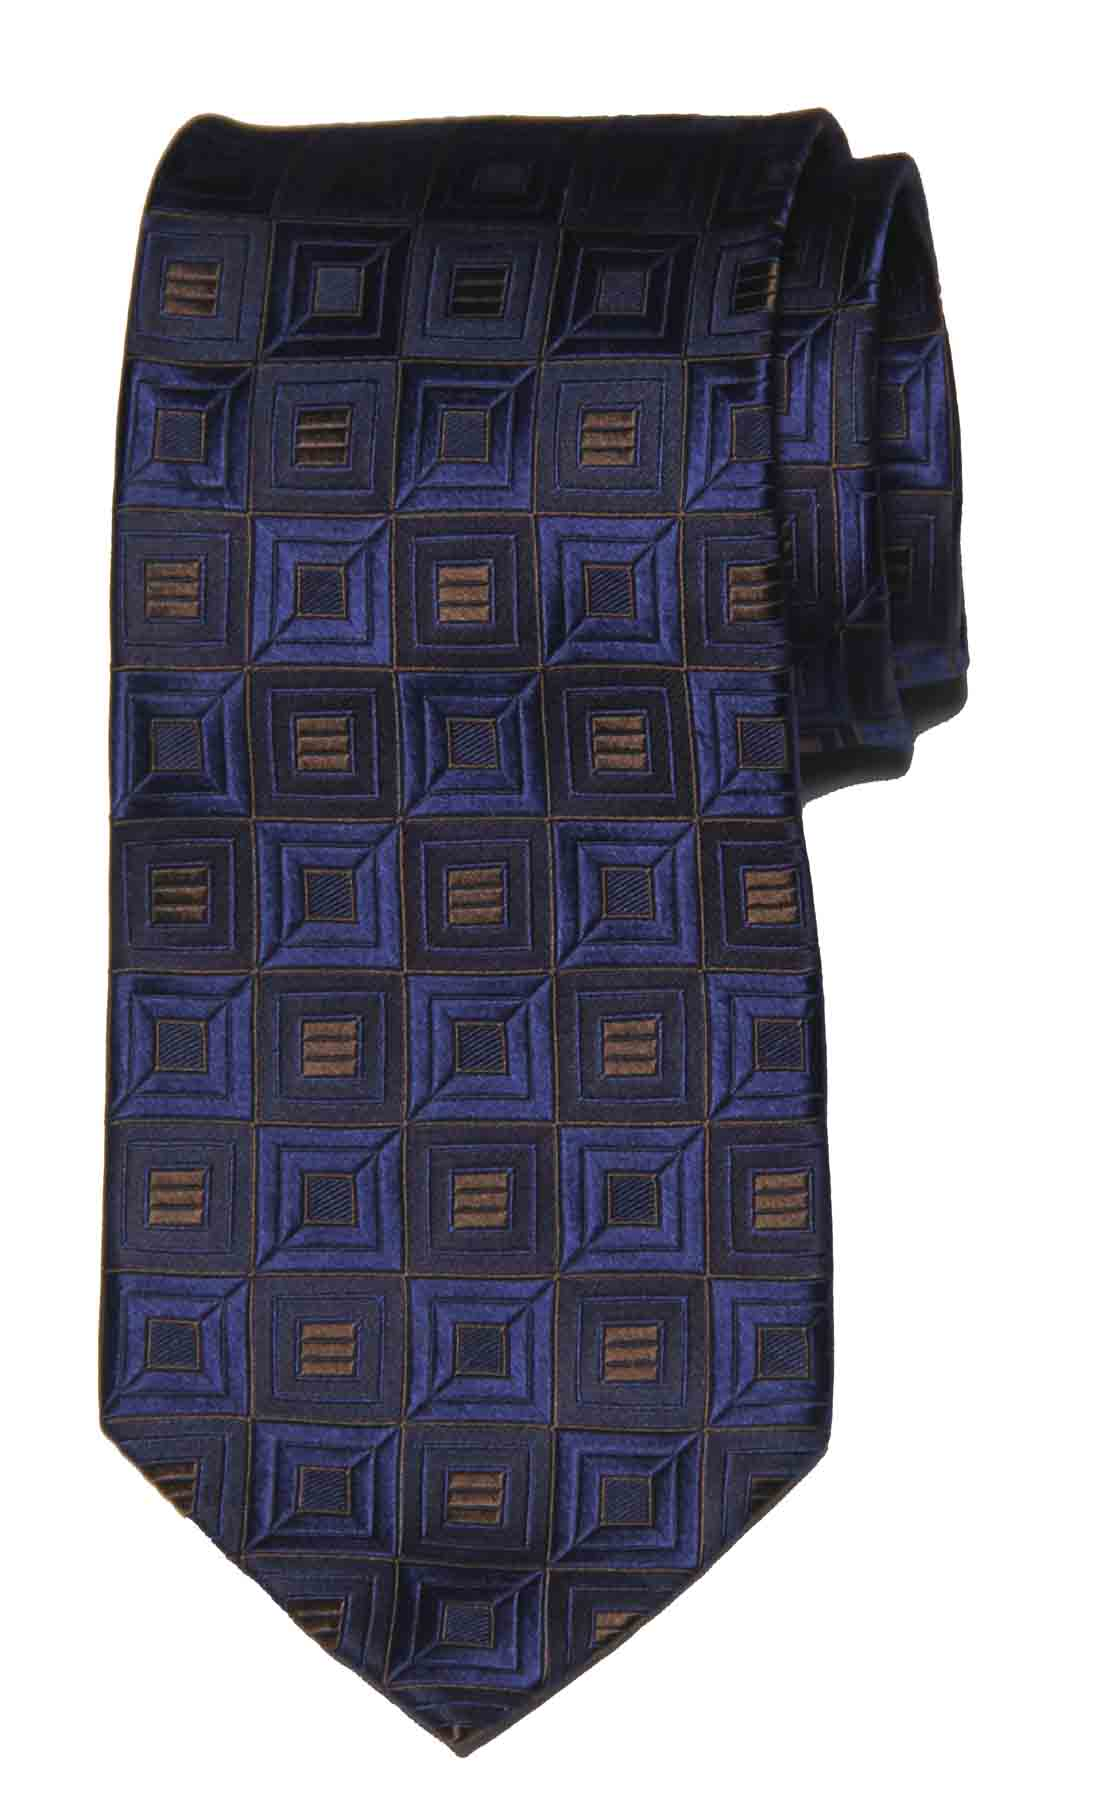 Michael Kors Tie Silk Navy Blue Brown Geometric Men's